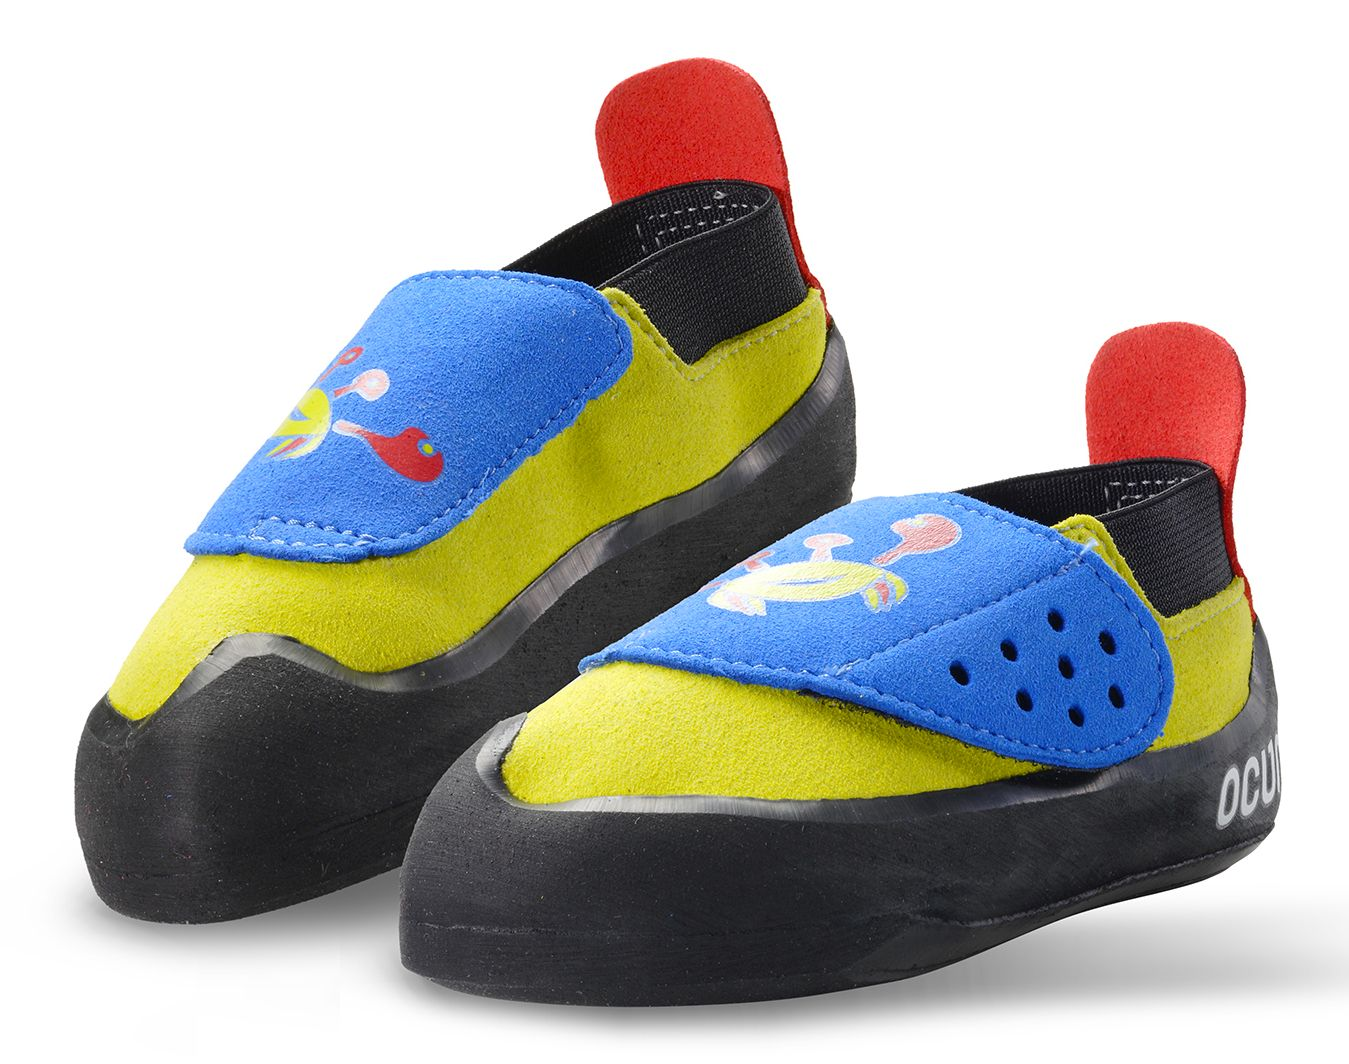 Buty Wspinaczkowe Ocun Hero QC 33 Blue Yellow